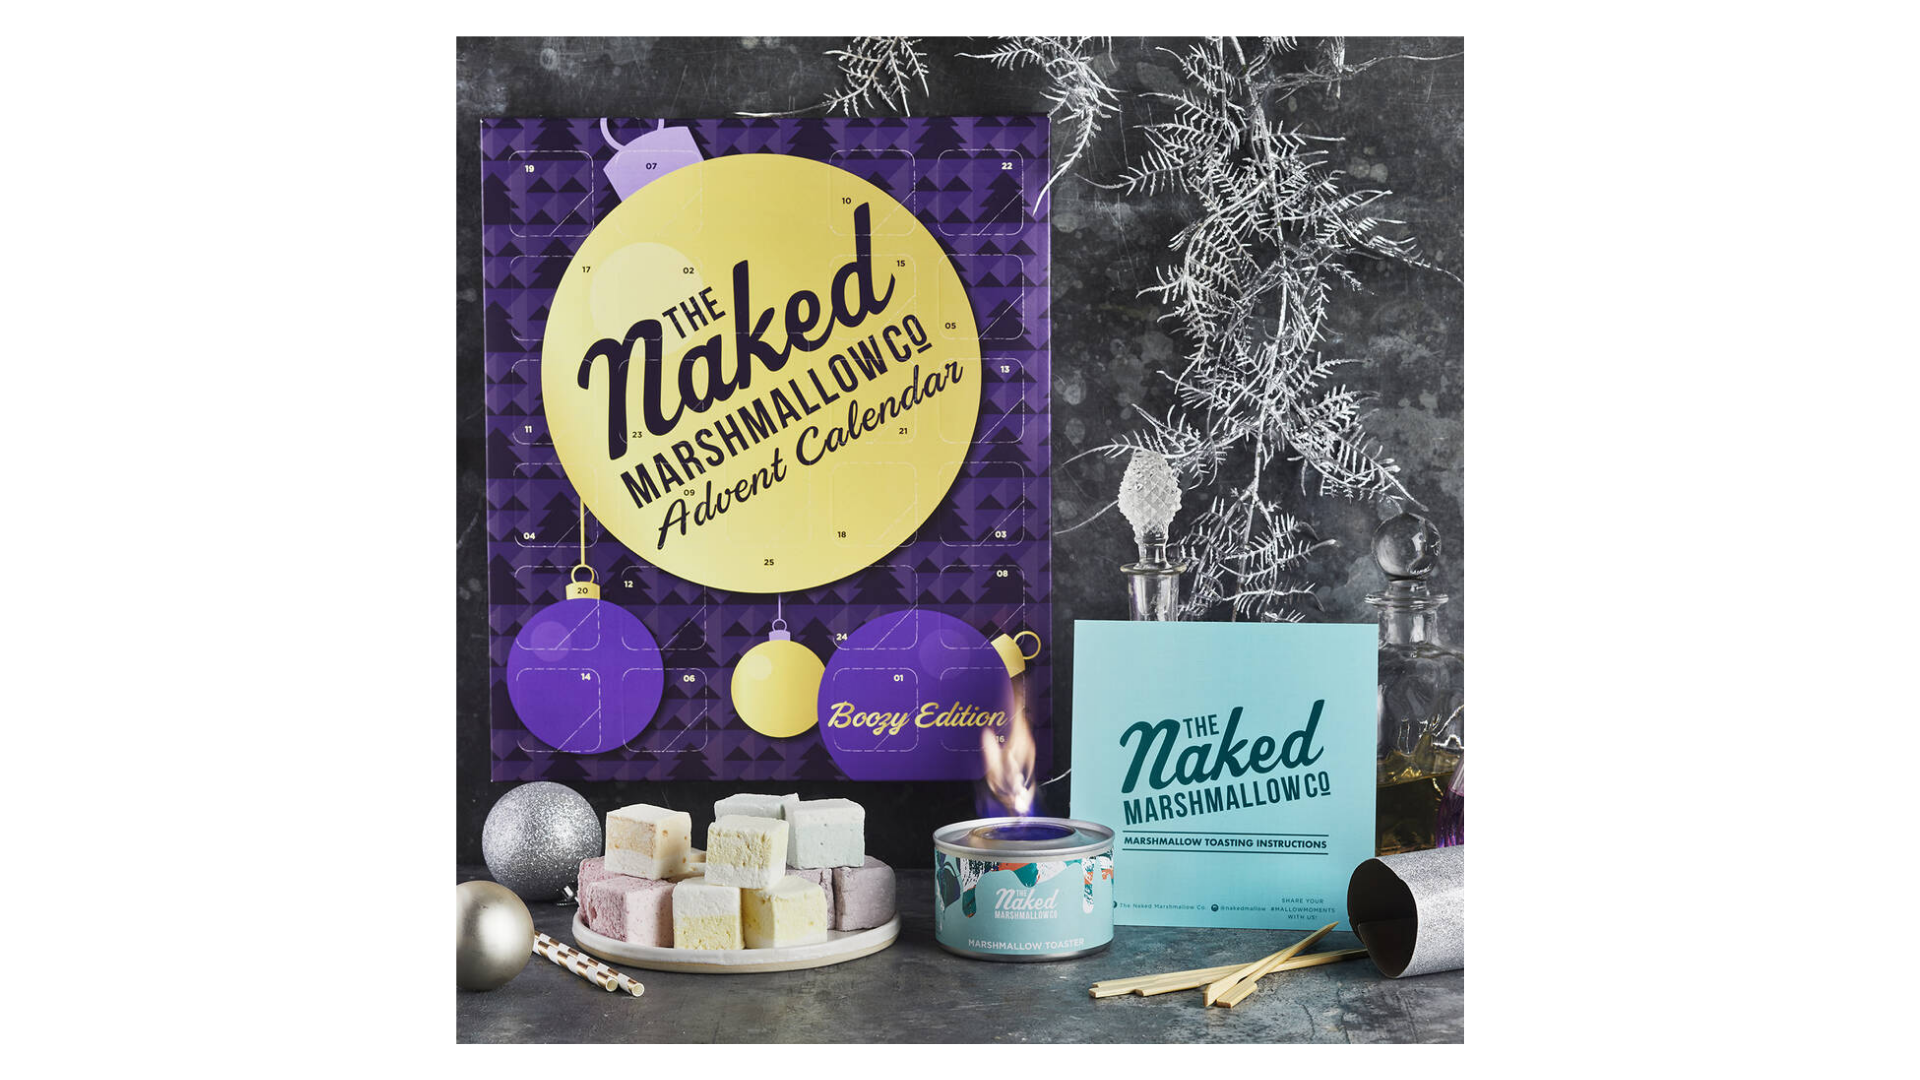 Calendrier de l'avent Naked Marshmallow 2021